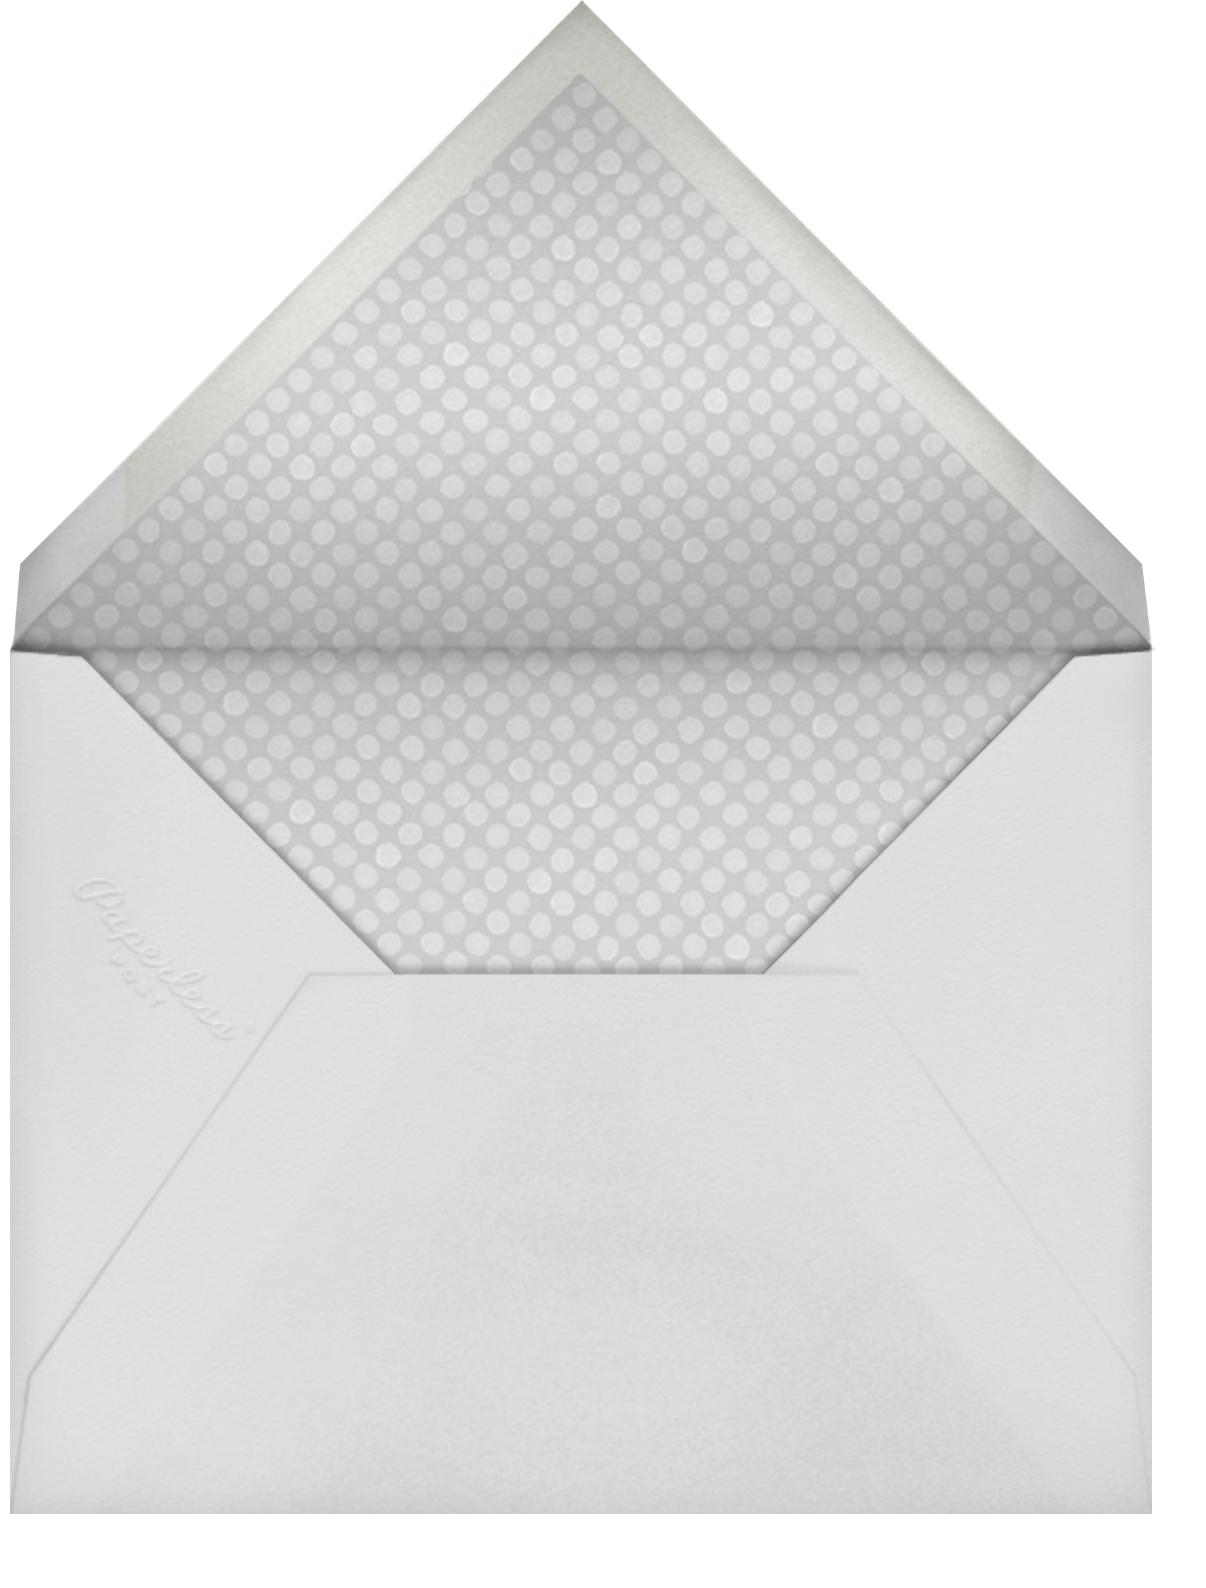 Pumpkin - Tall - Paperless Post - Thanksgiving - envelope back